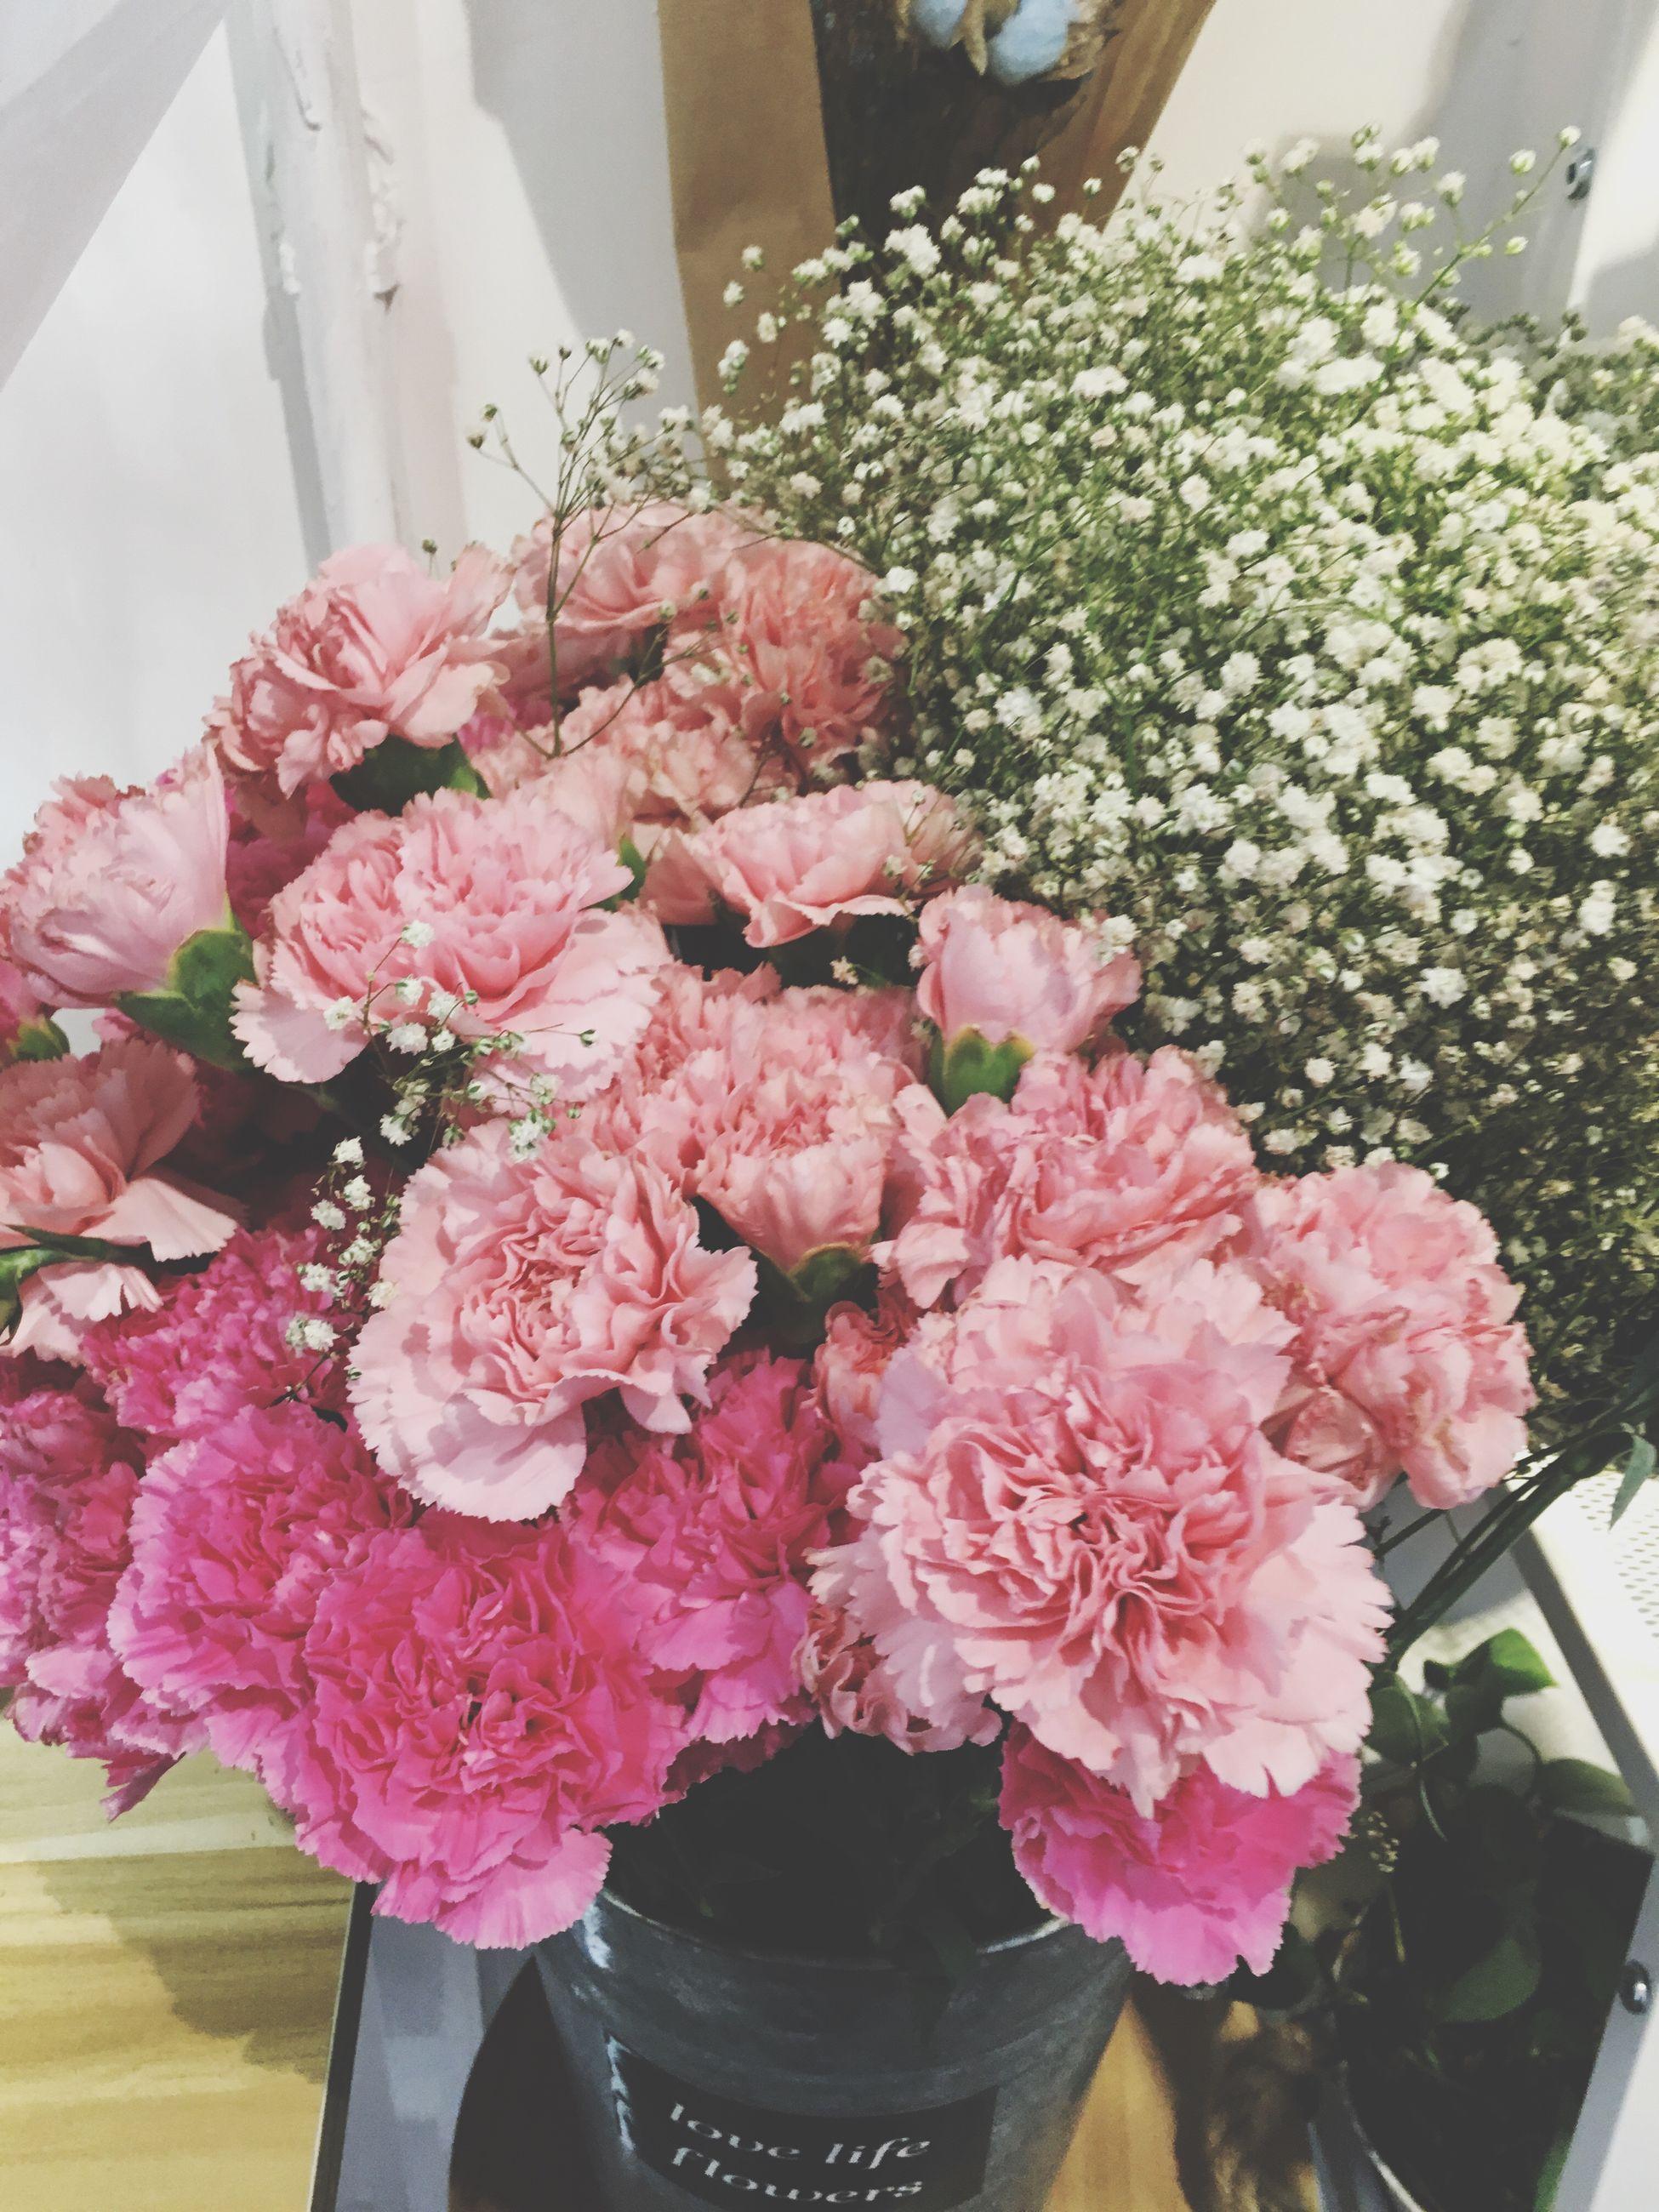 flower, beauty in nature, fragility, bouquet, nature, pink color, freshness, no people, rose - flower, petal, close-up, flower head, plant, indoors, flower shop, growth, day, flower market, florist